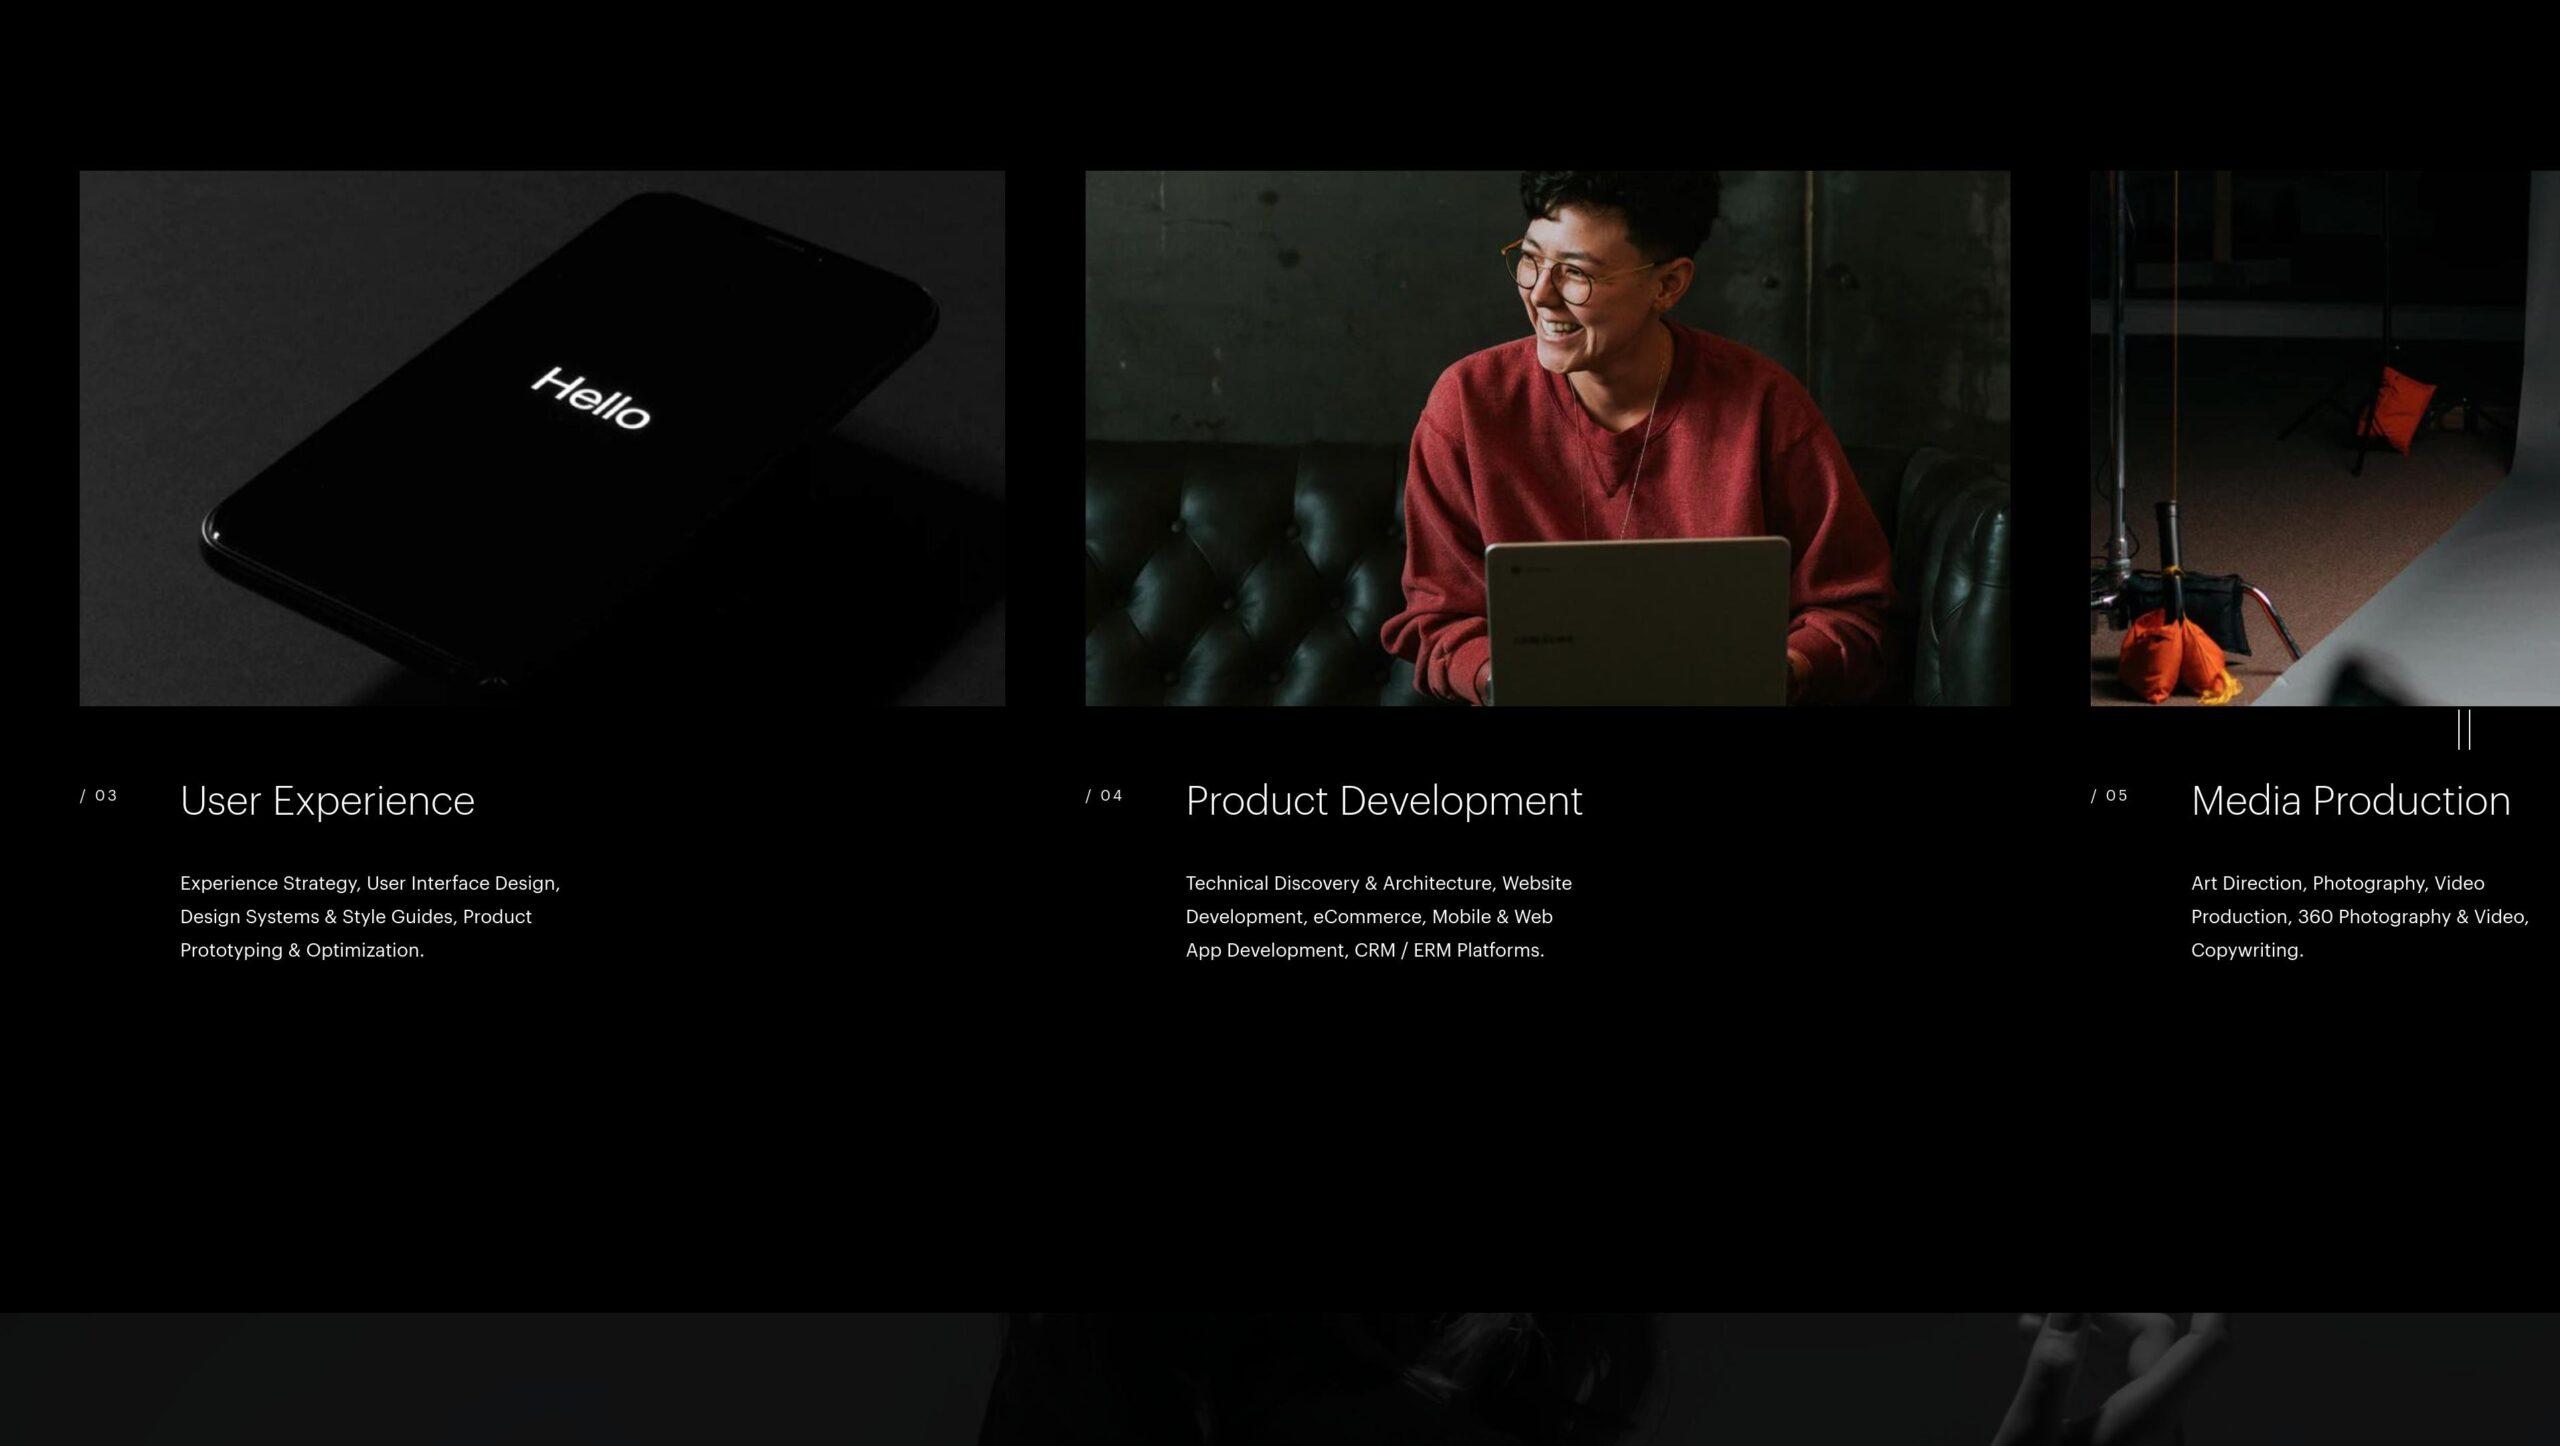 Orpetron Web Design Awards - Fleava Digital Agency - Web Design Awards Inspiration Trends UI UX